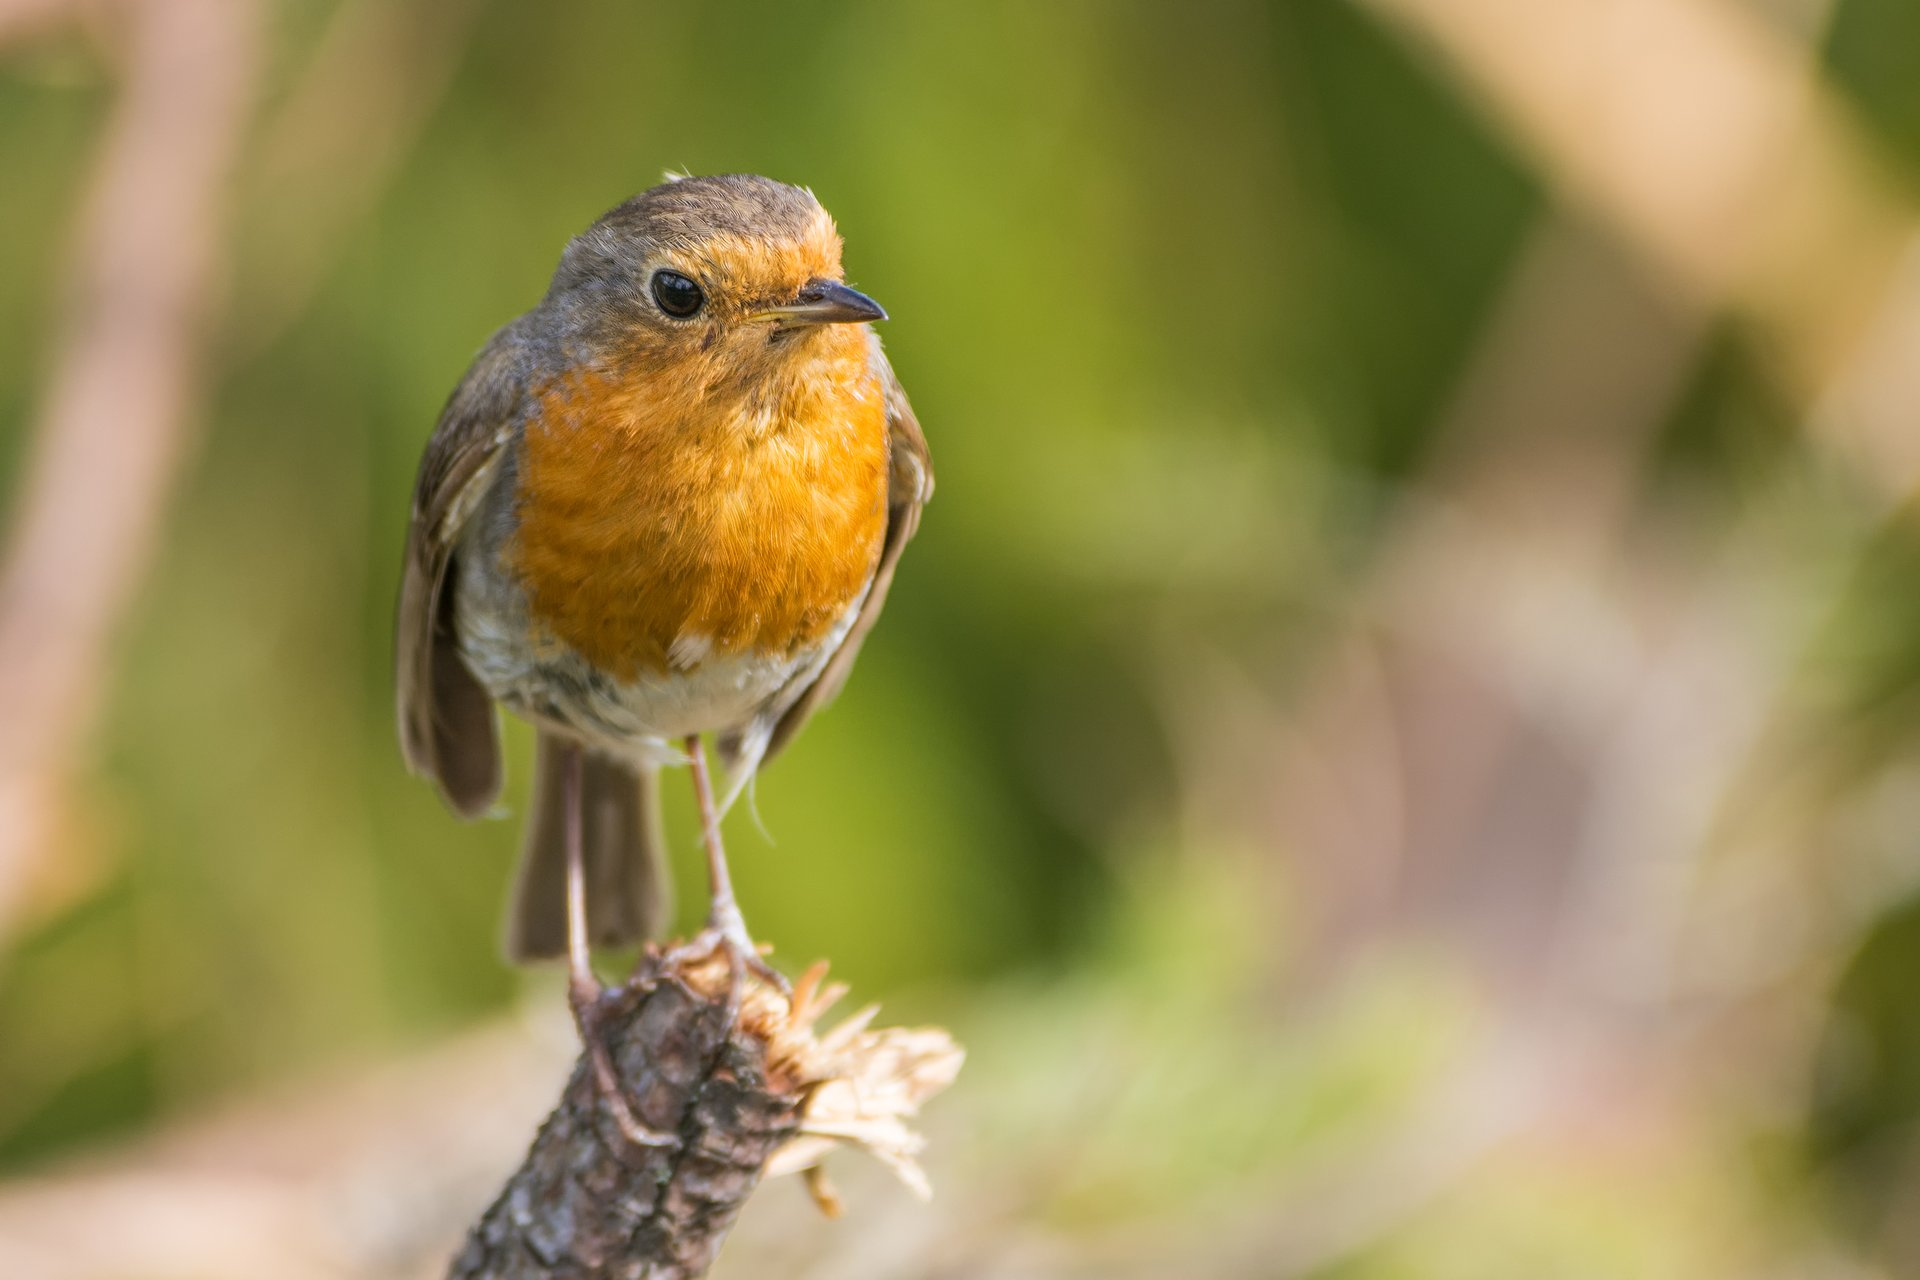 Birdwatching in Slovakia 2020 - Best Time